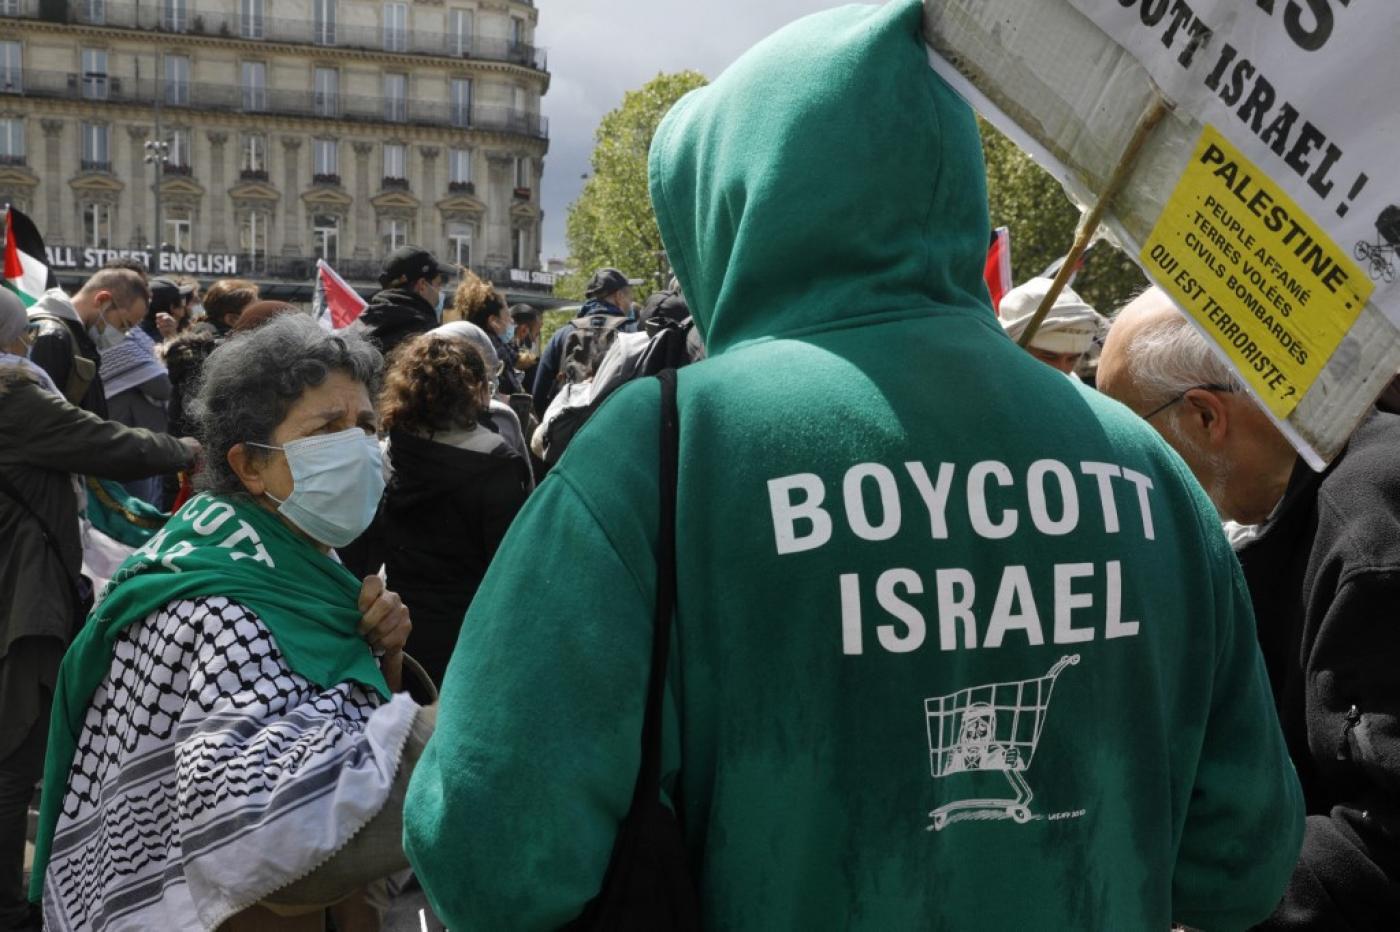 More than 150 academics call on EU to stop funding Israeli universities